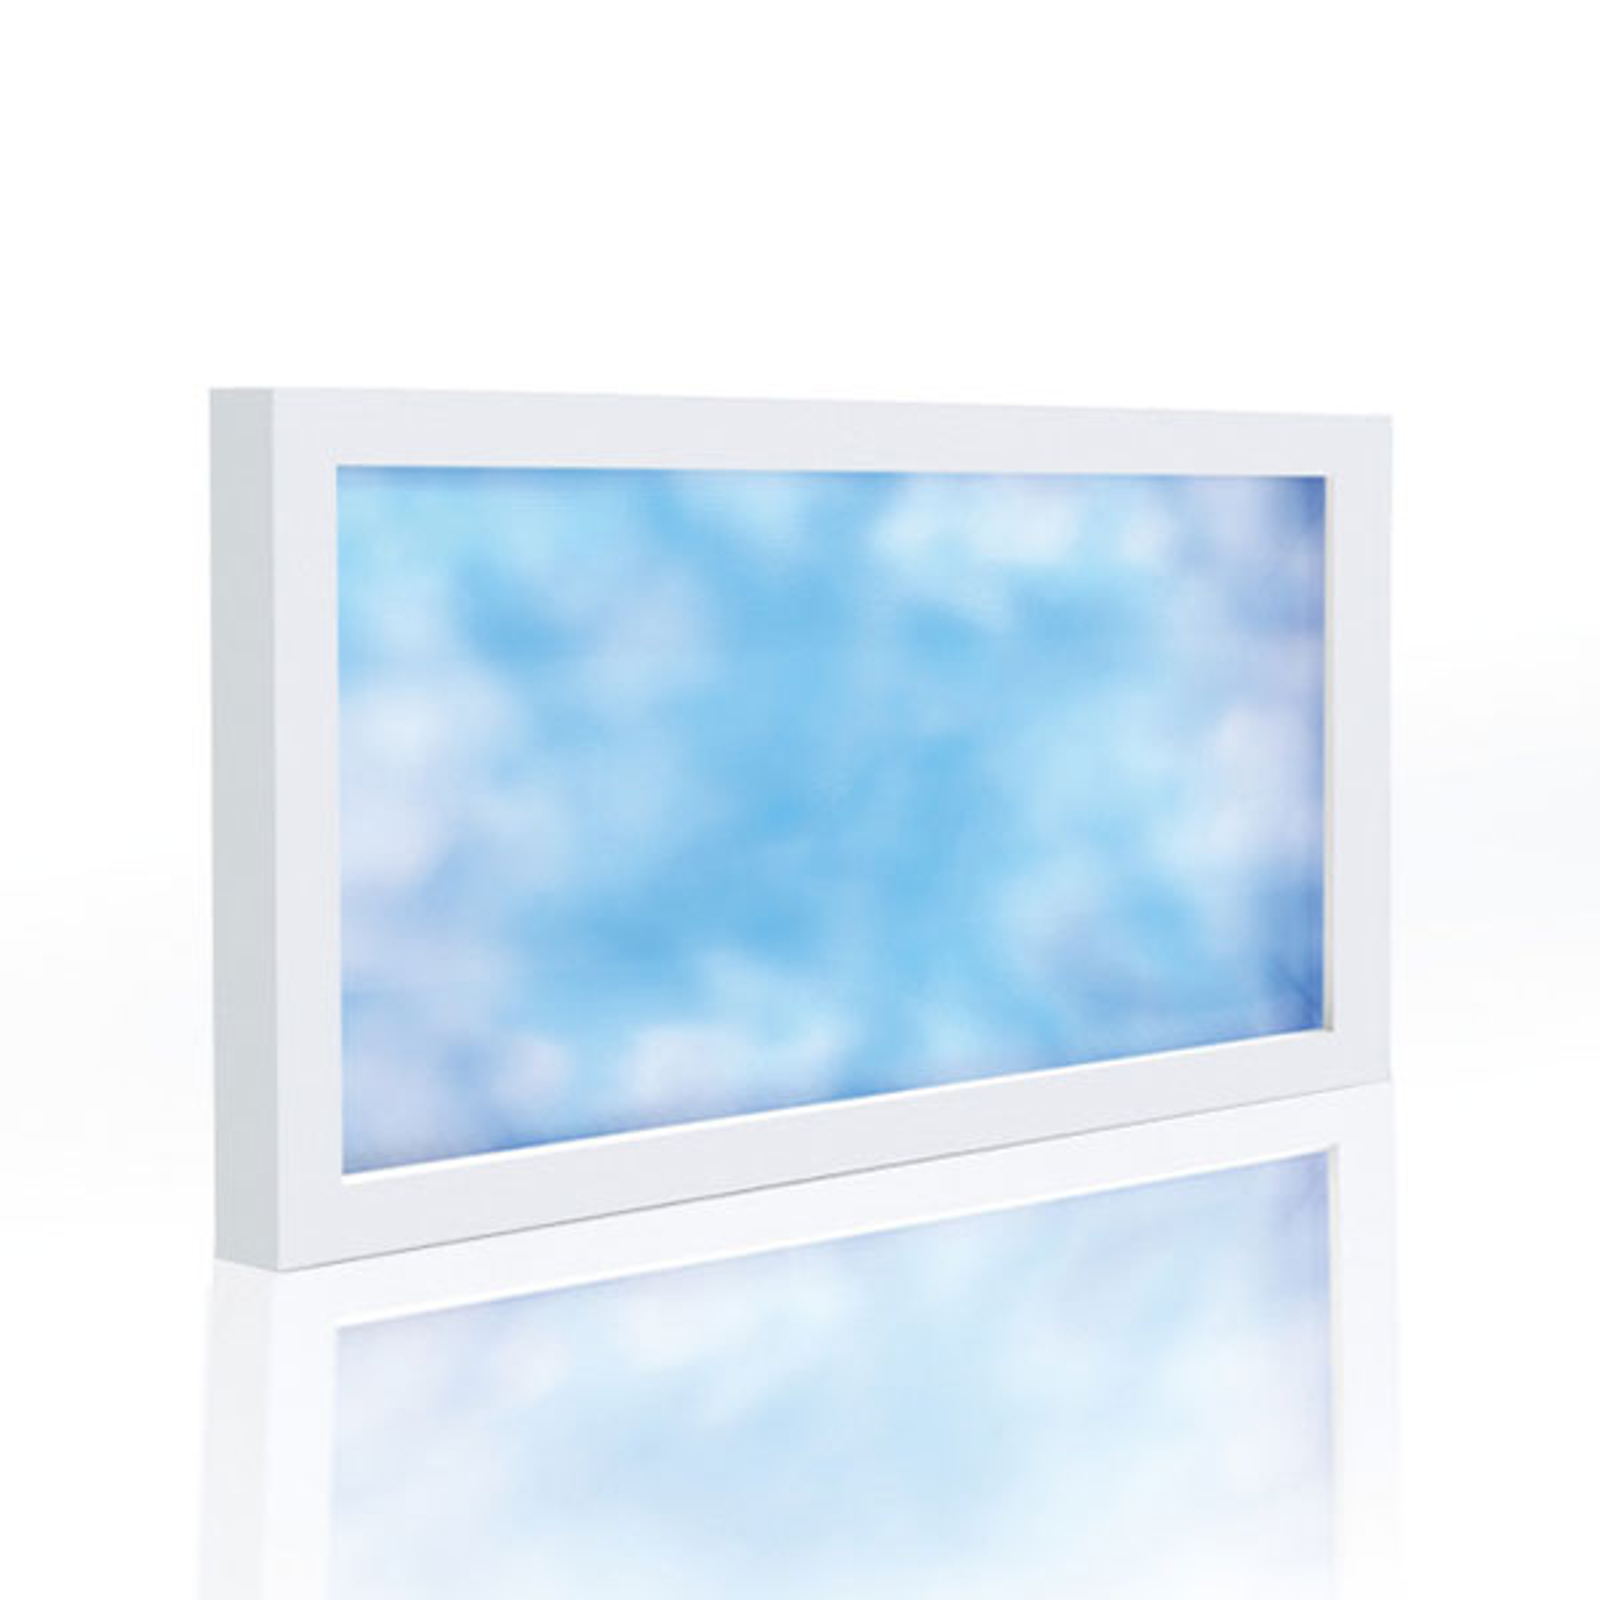 LED-Panel Sky Window 120 x 60cm